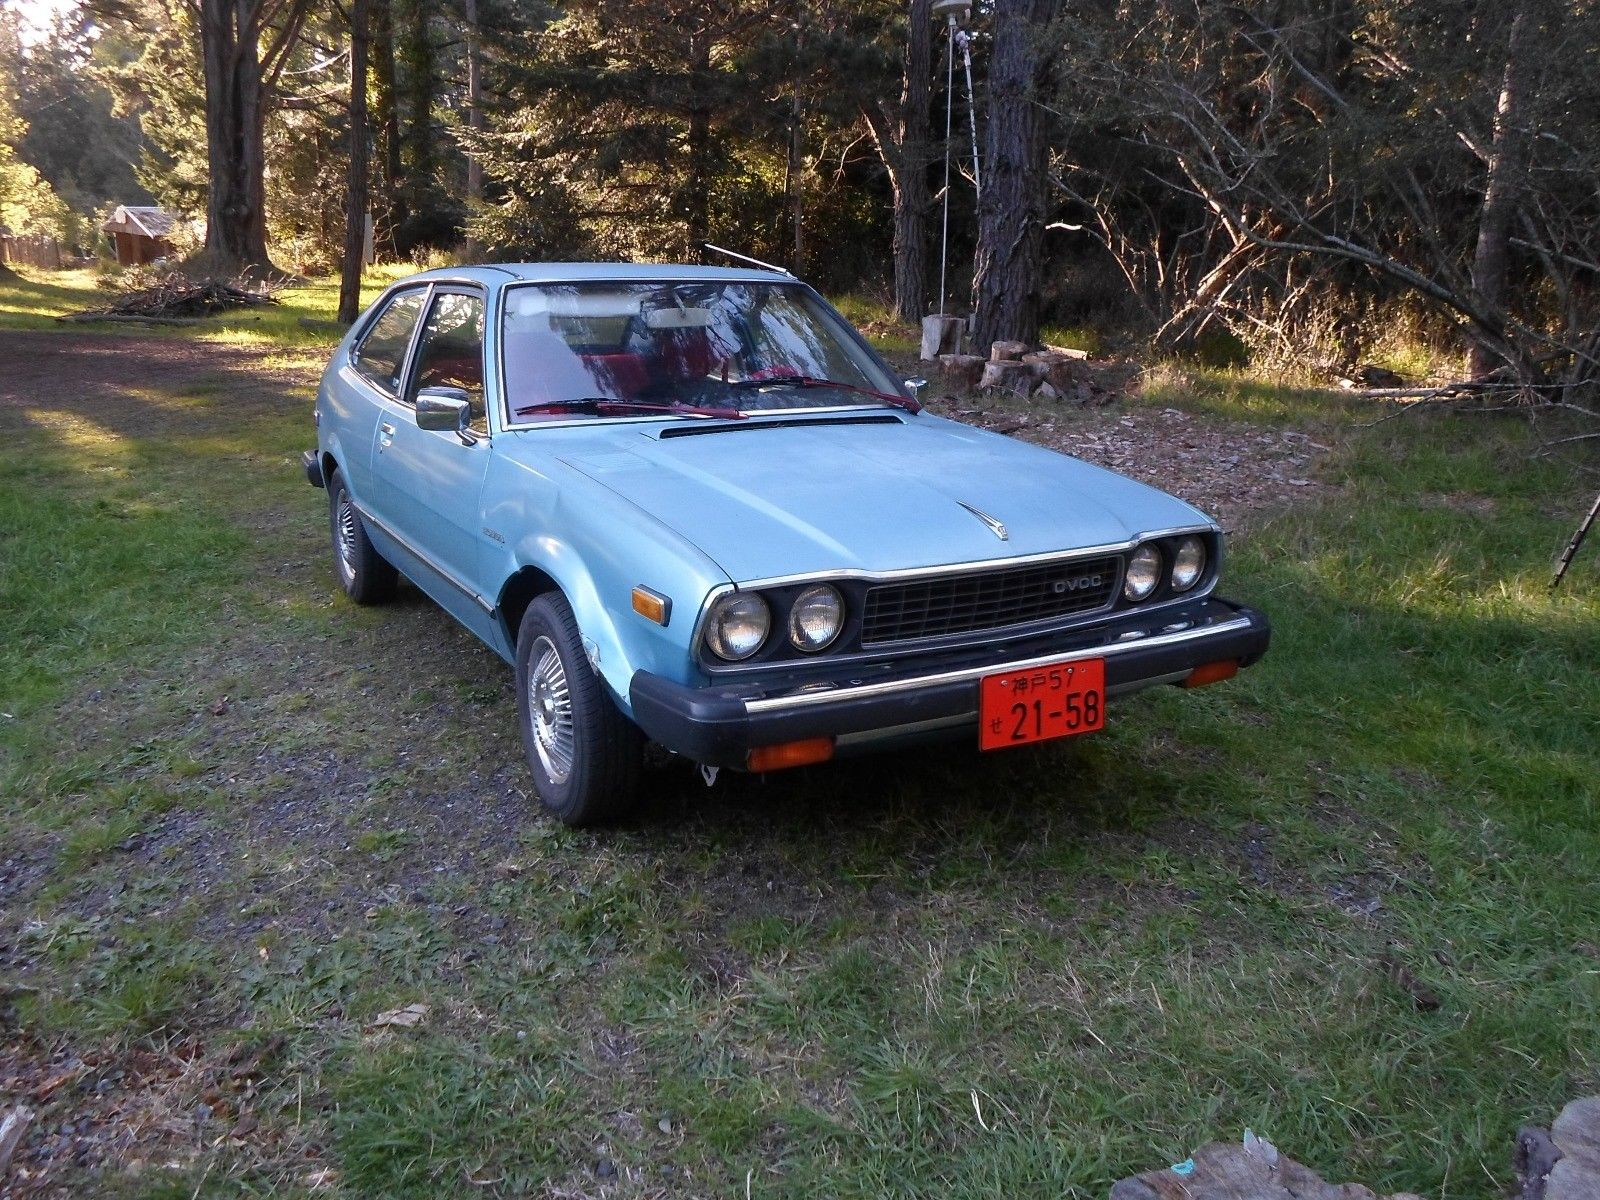 Amazing 1977 Honda Accord Rare Find 1977 Honda Cvcc 2 Door Accord